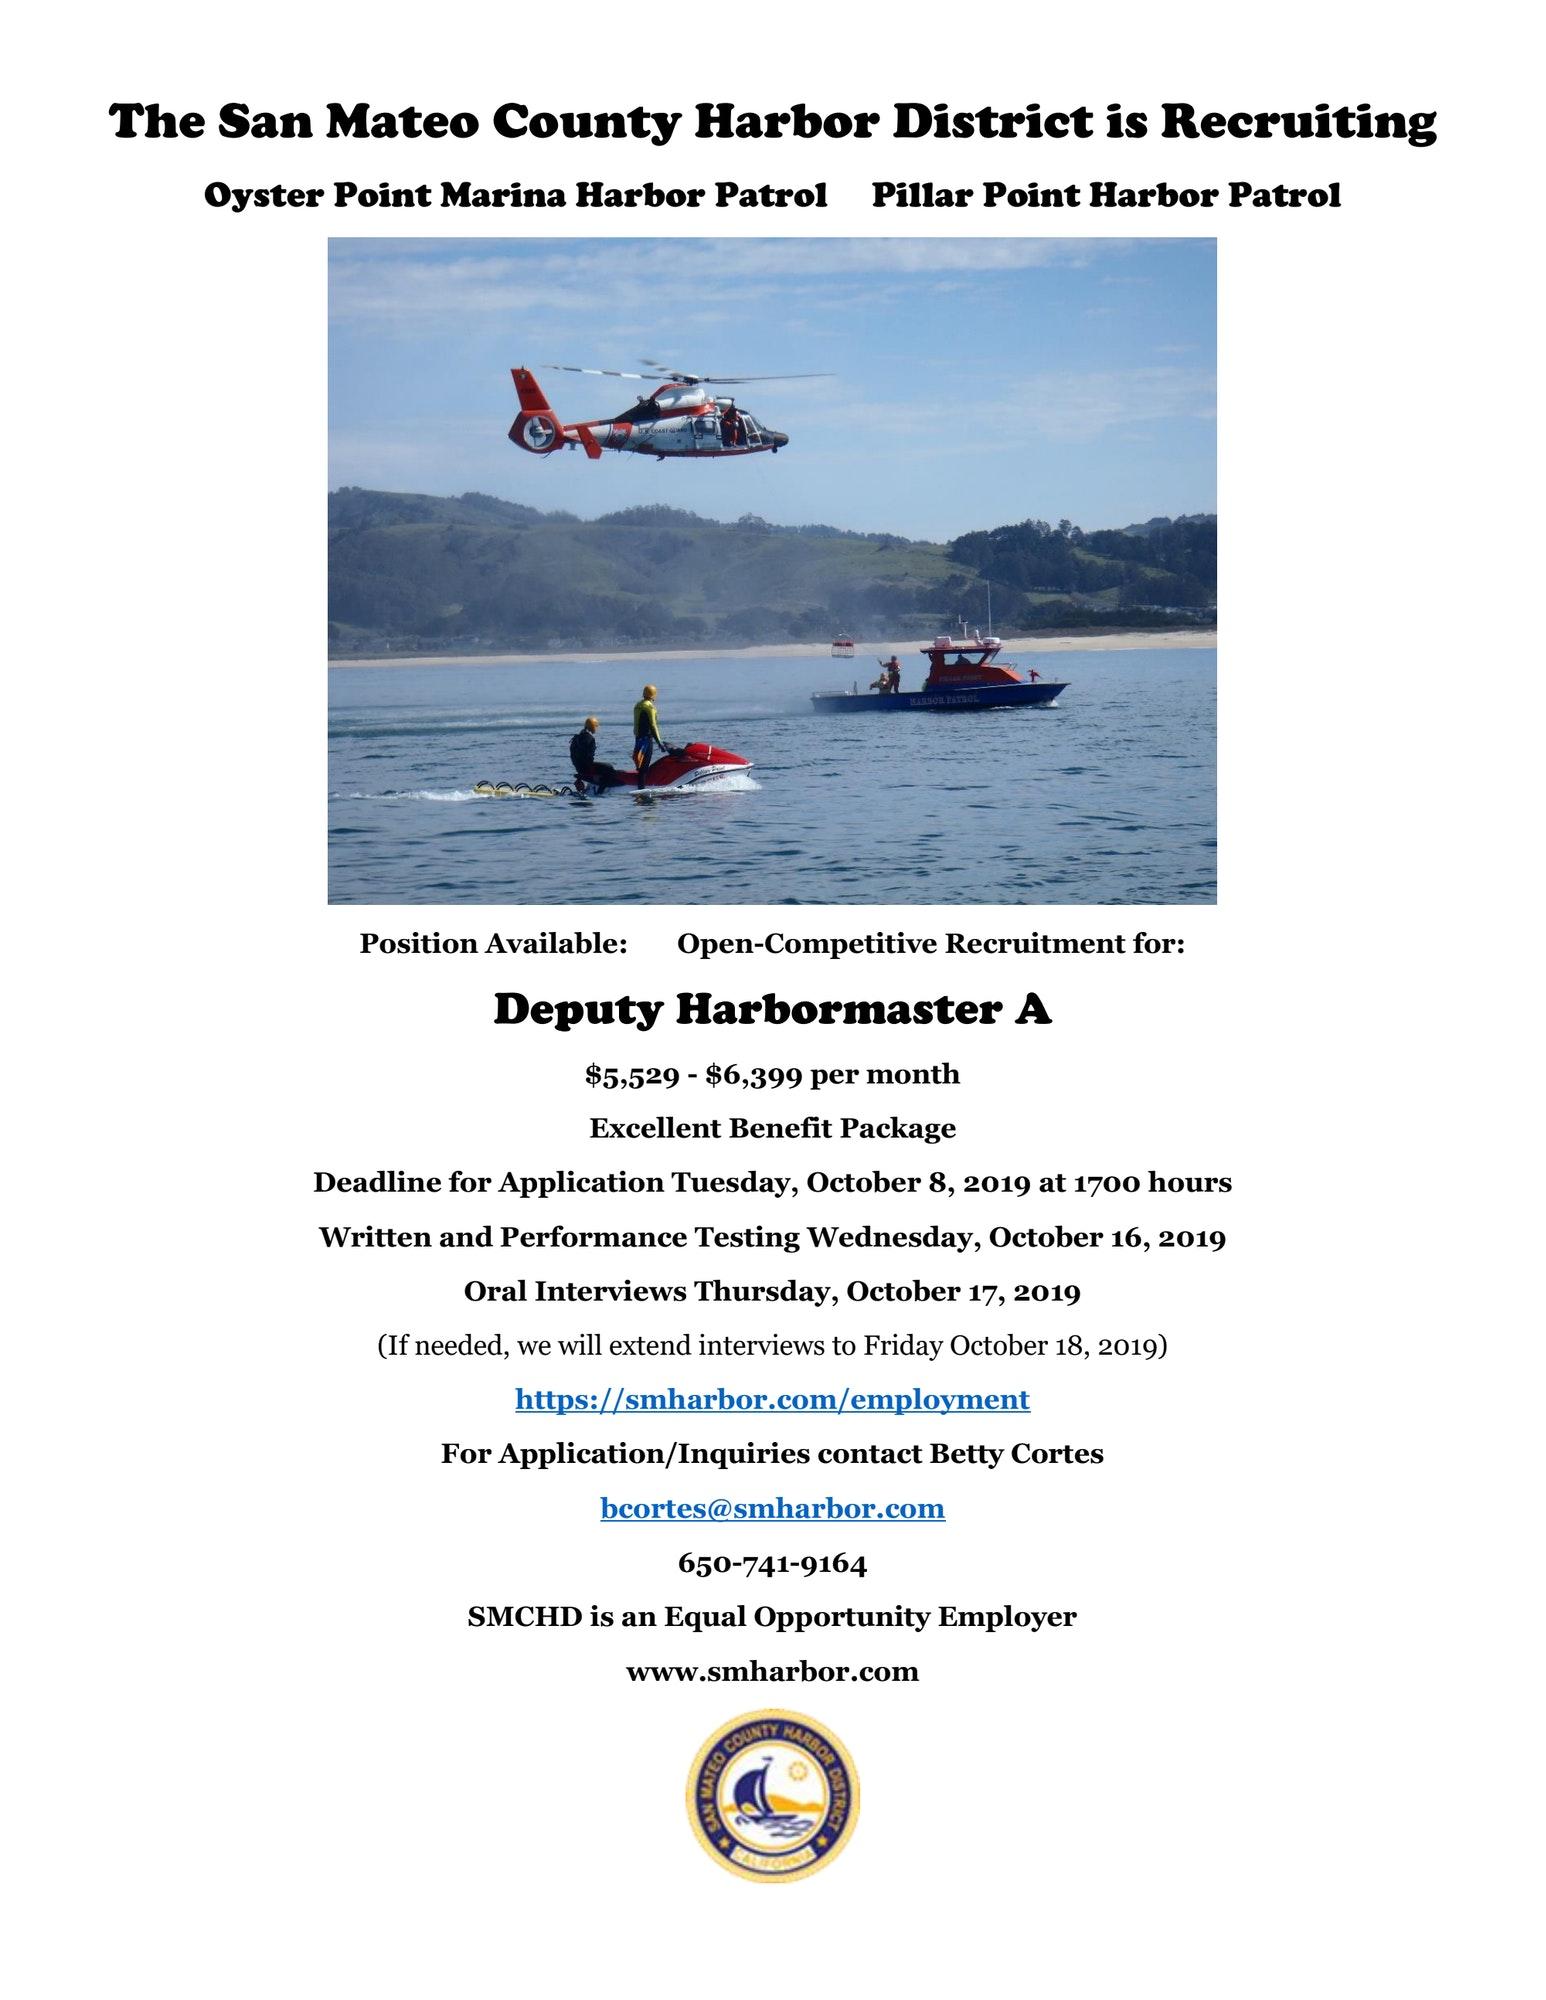 Job posting for Deputy Harbor Master